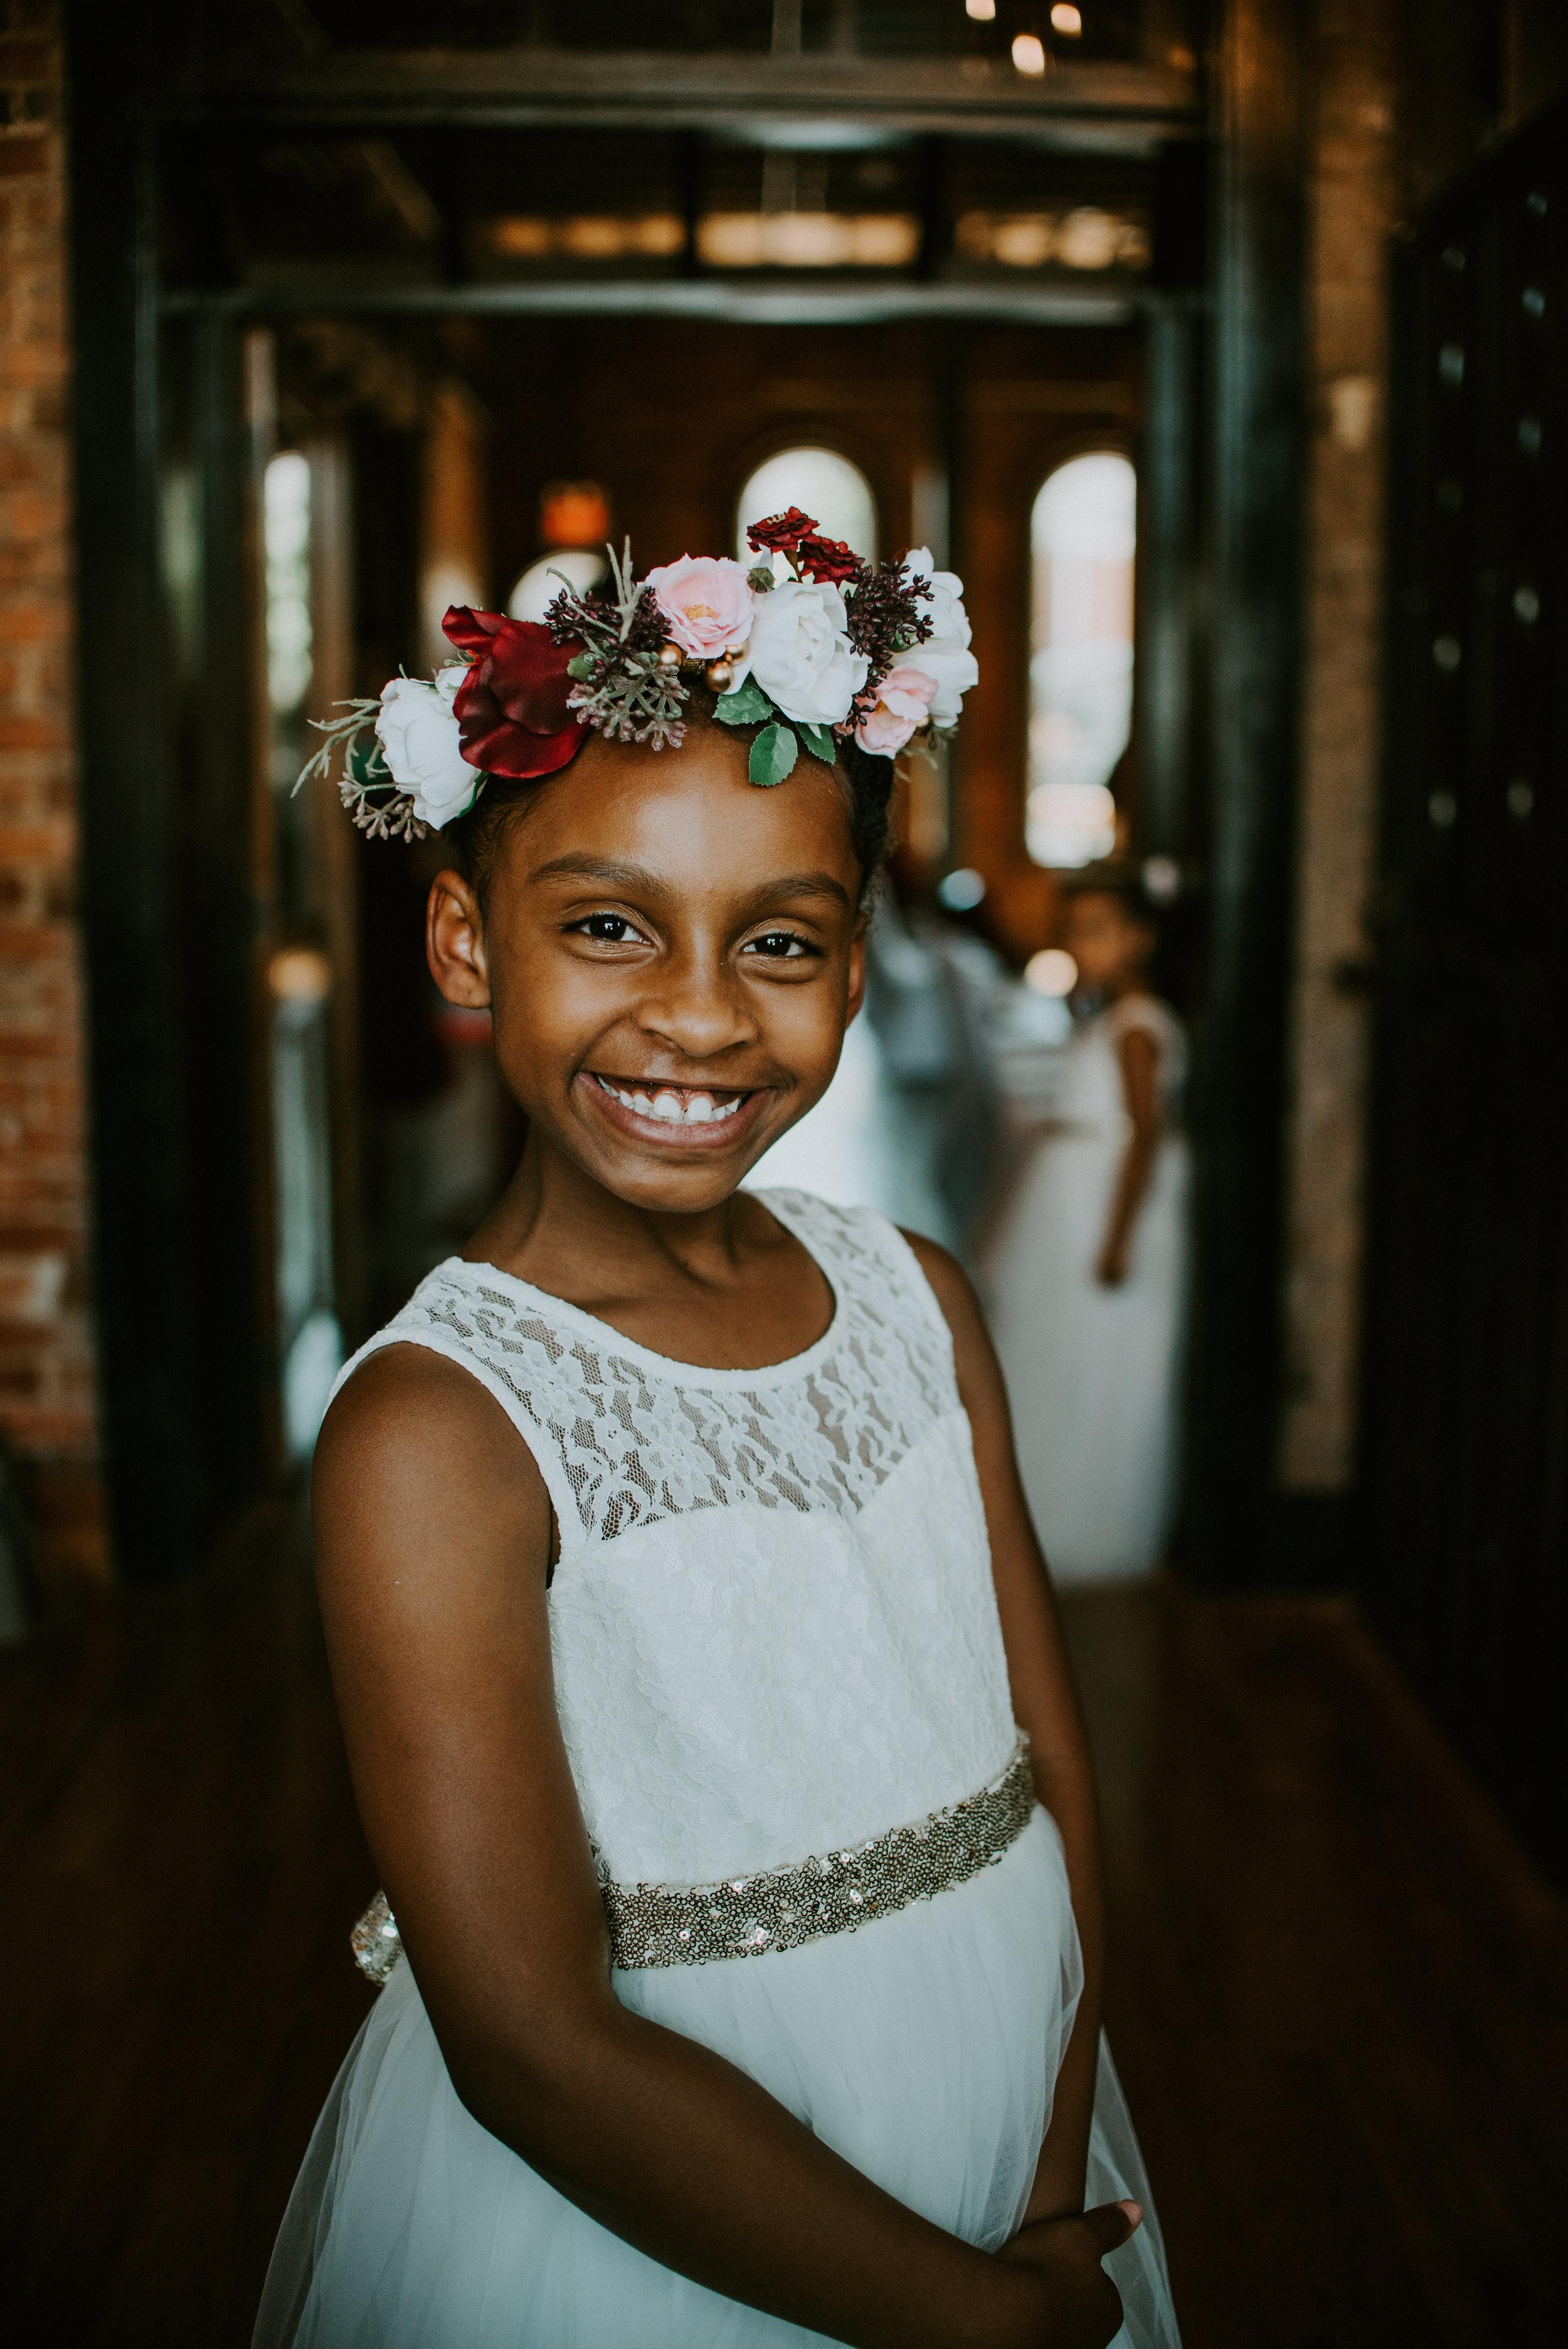 WonderlyCreative_Wedding_6.7.18_Khara&Dwayne_-396.jpg